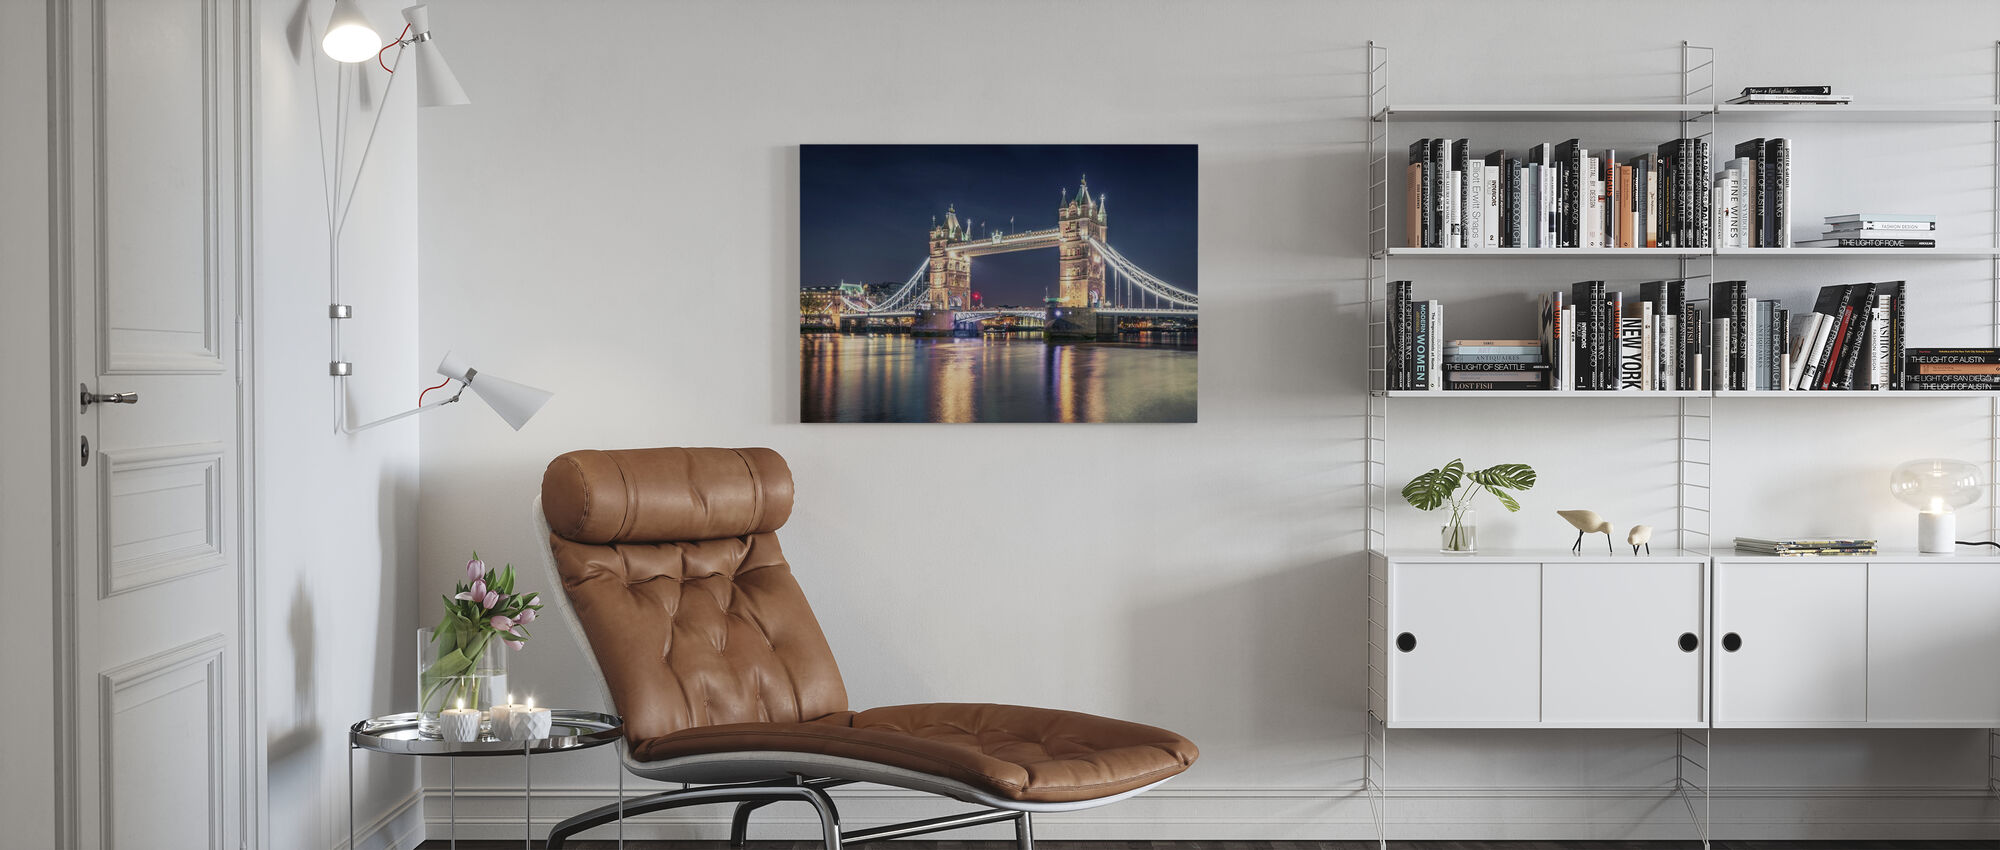 Night at the Tower Bridge - Canvas print - Living Room